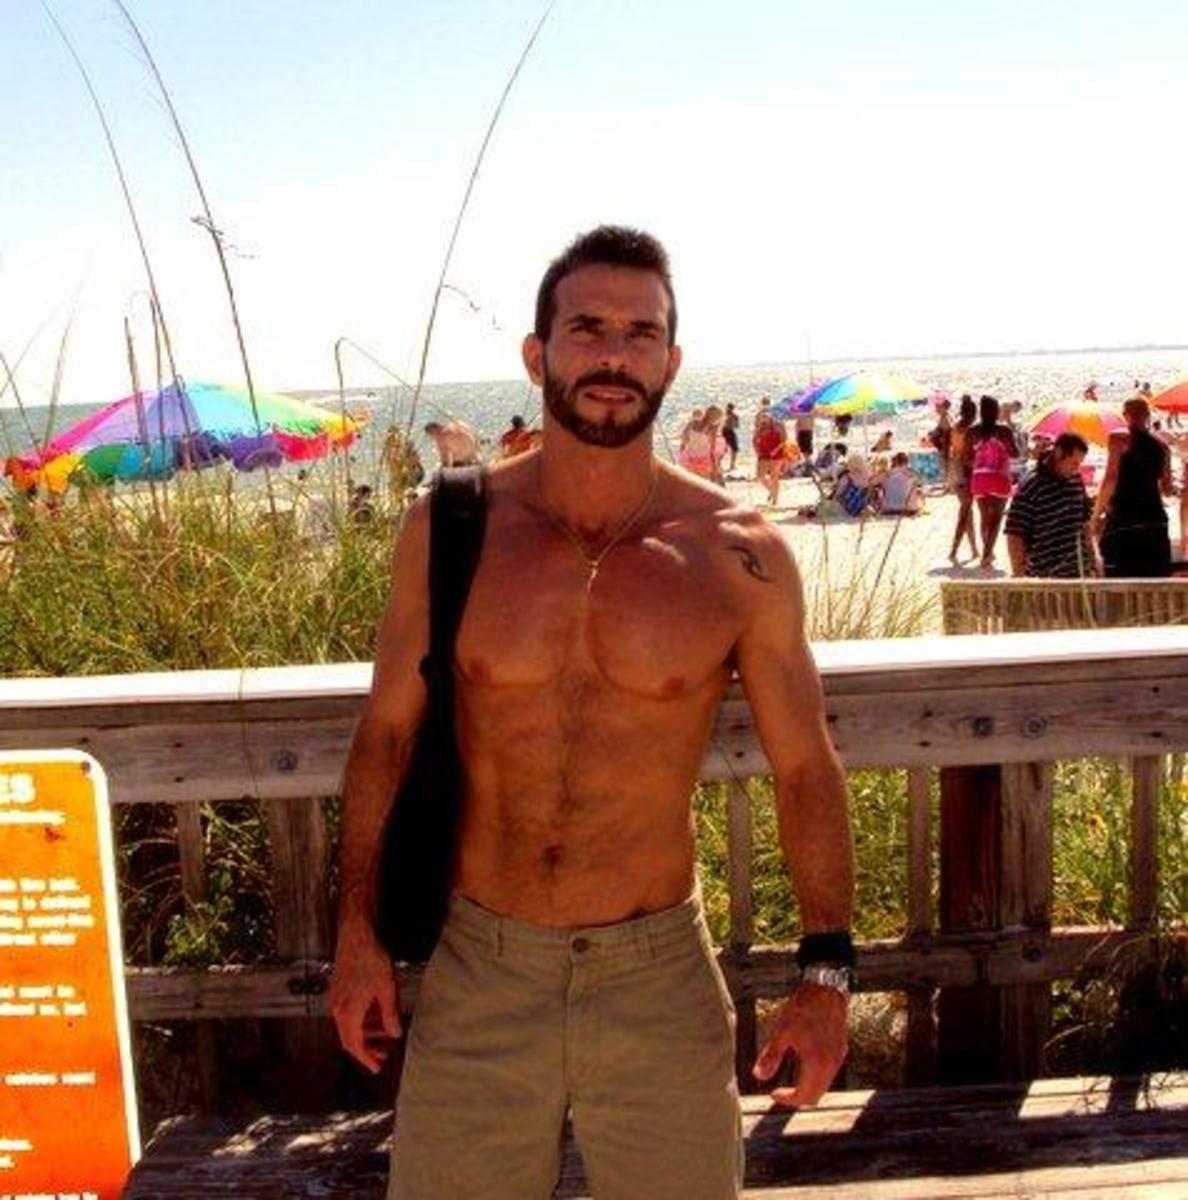 Moore at Beach n Santa Monica